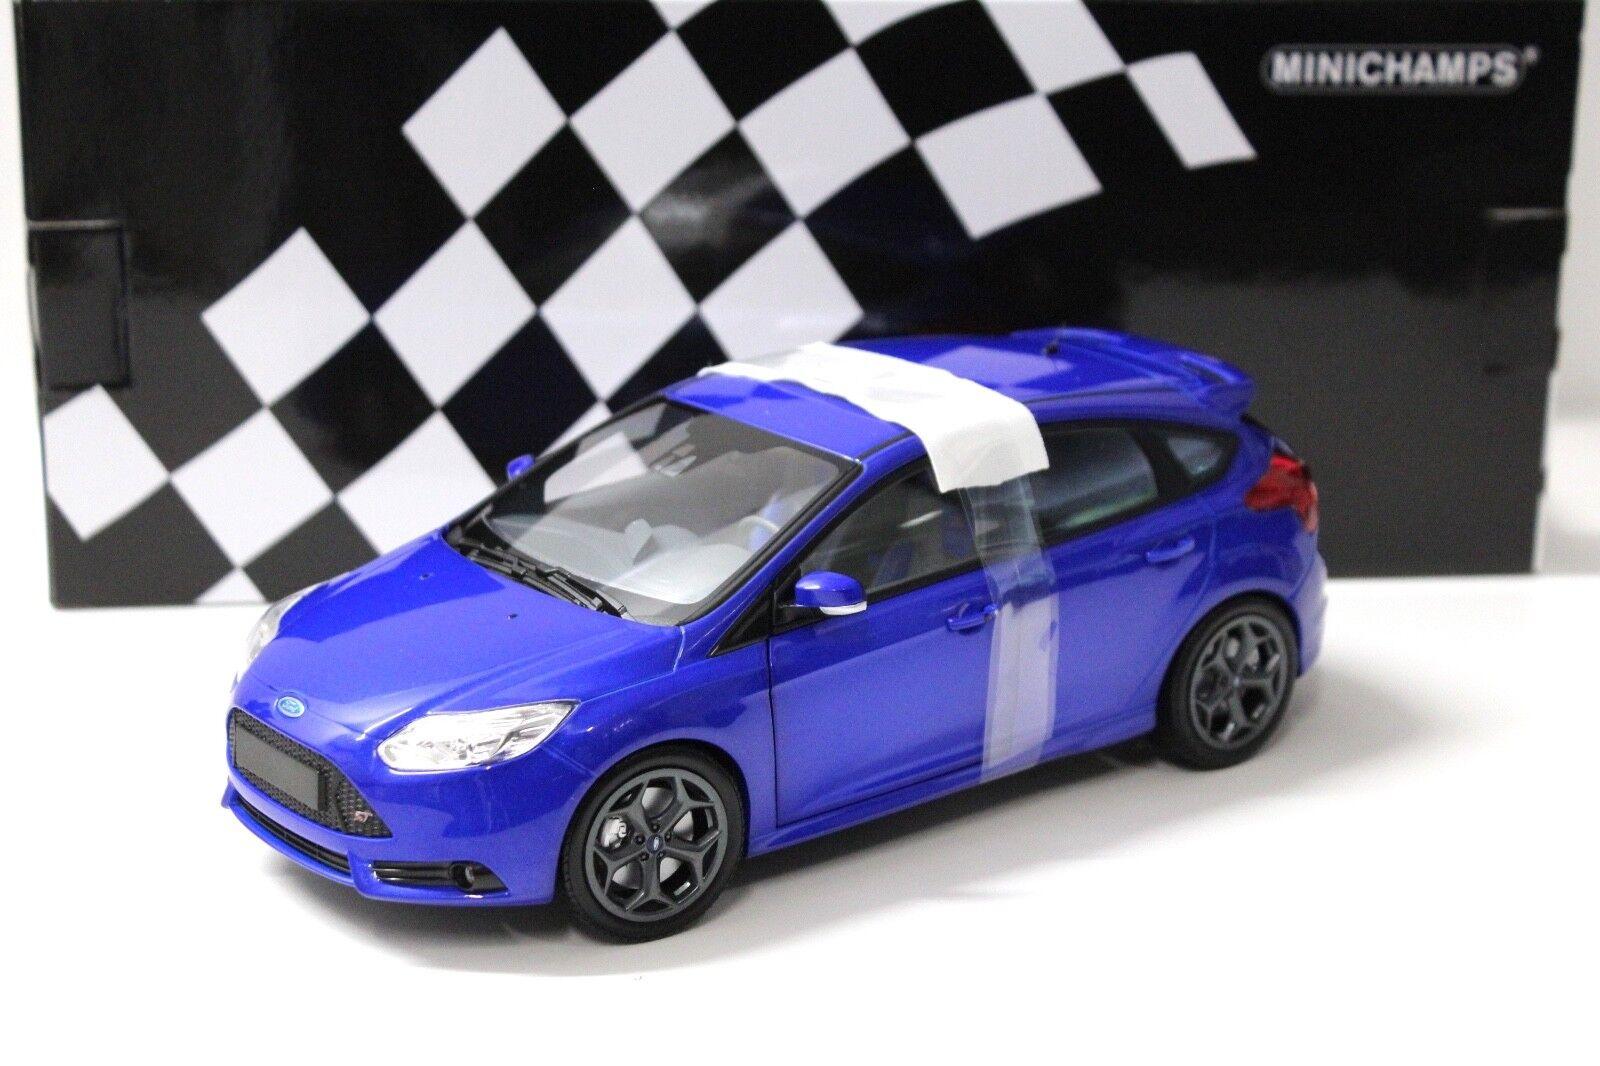 1:18 Minichamps Ford Focus ST 2011 blu NEW in Premium-MODELCARS